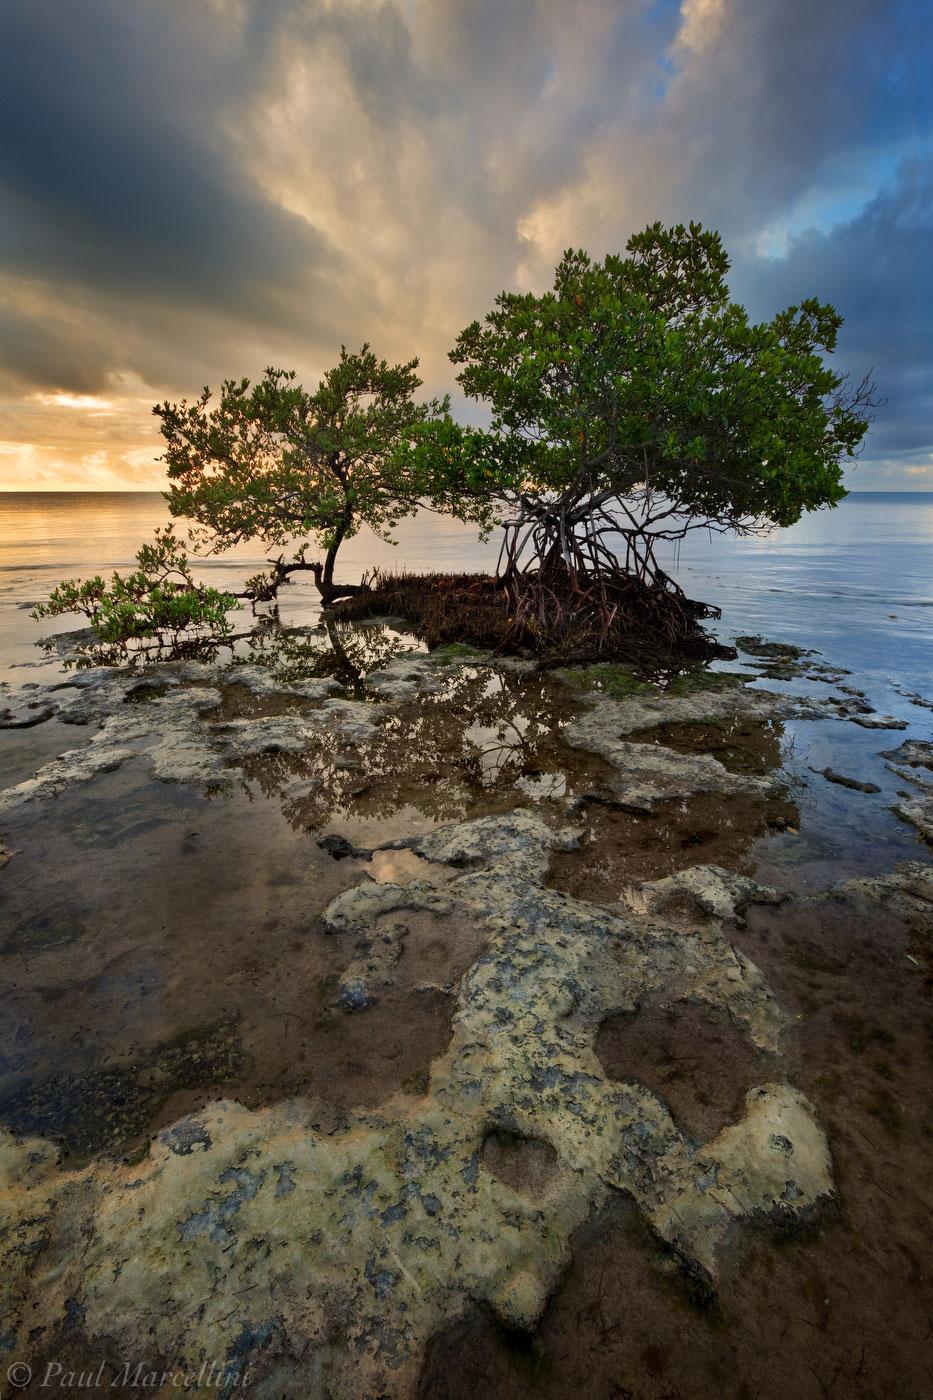 red mangrove, black mangrove, florida, keys, big pine, sunrise, florida keys, south florida, nature, photography, , photo